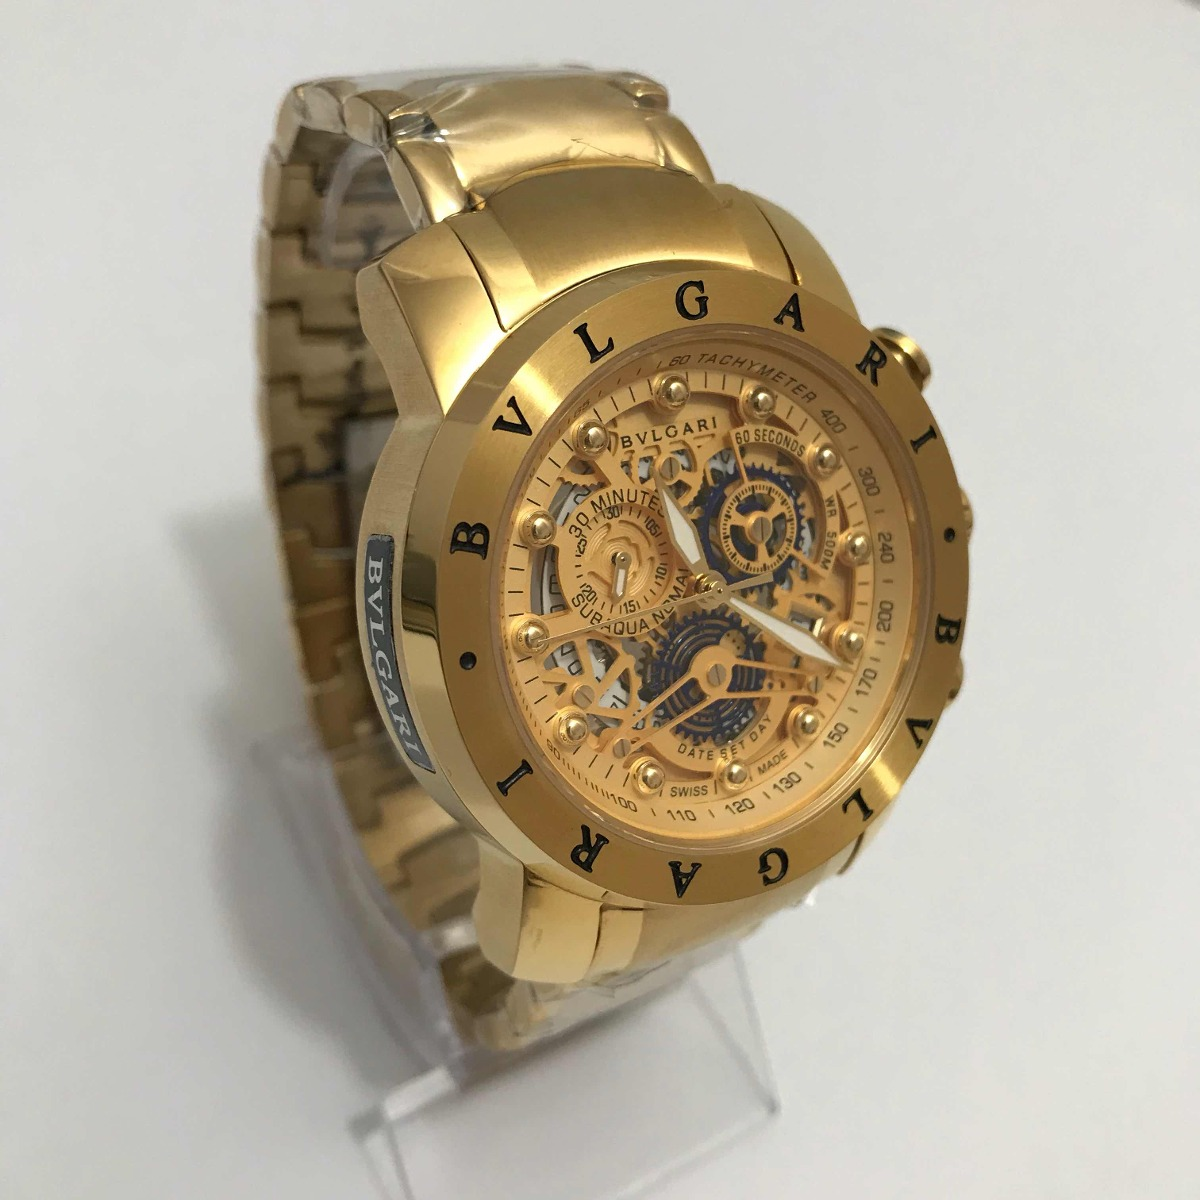 37f9b4032d4 relógio bvlgari iron man dourado esqueleto. Carregando zoom.